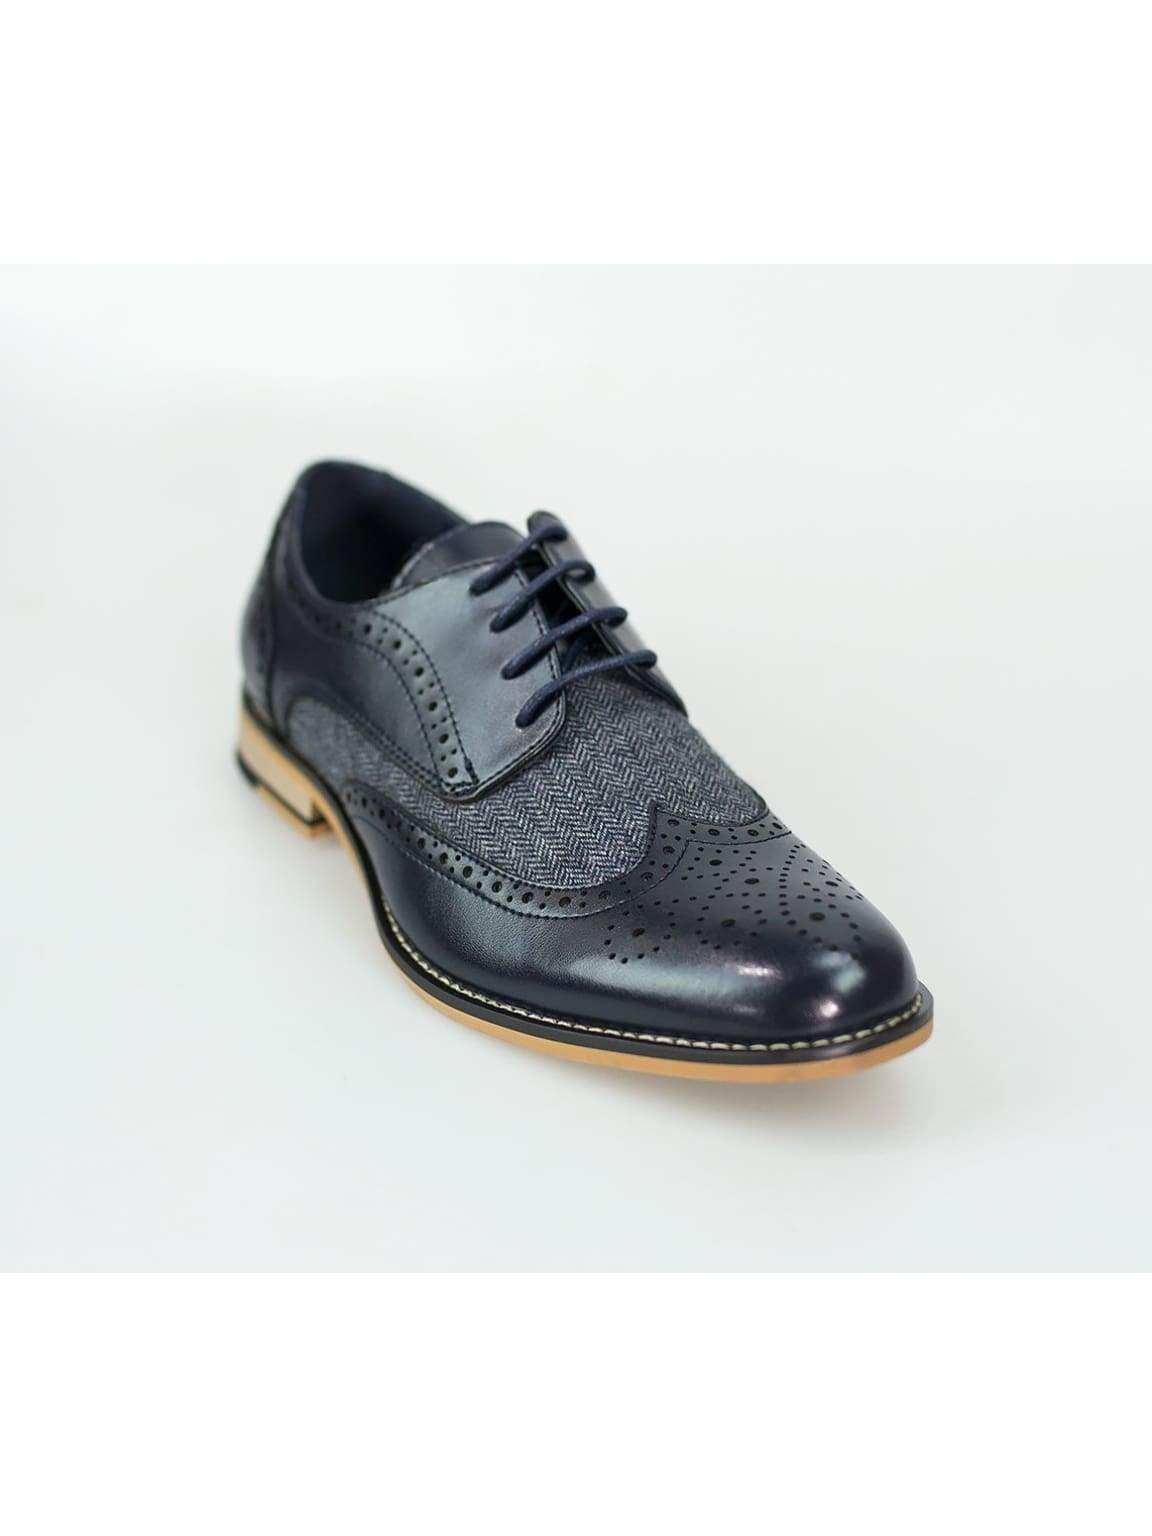 Horatio Navy Tweed Brogue Shoes - Shoes